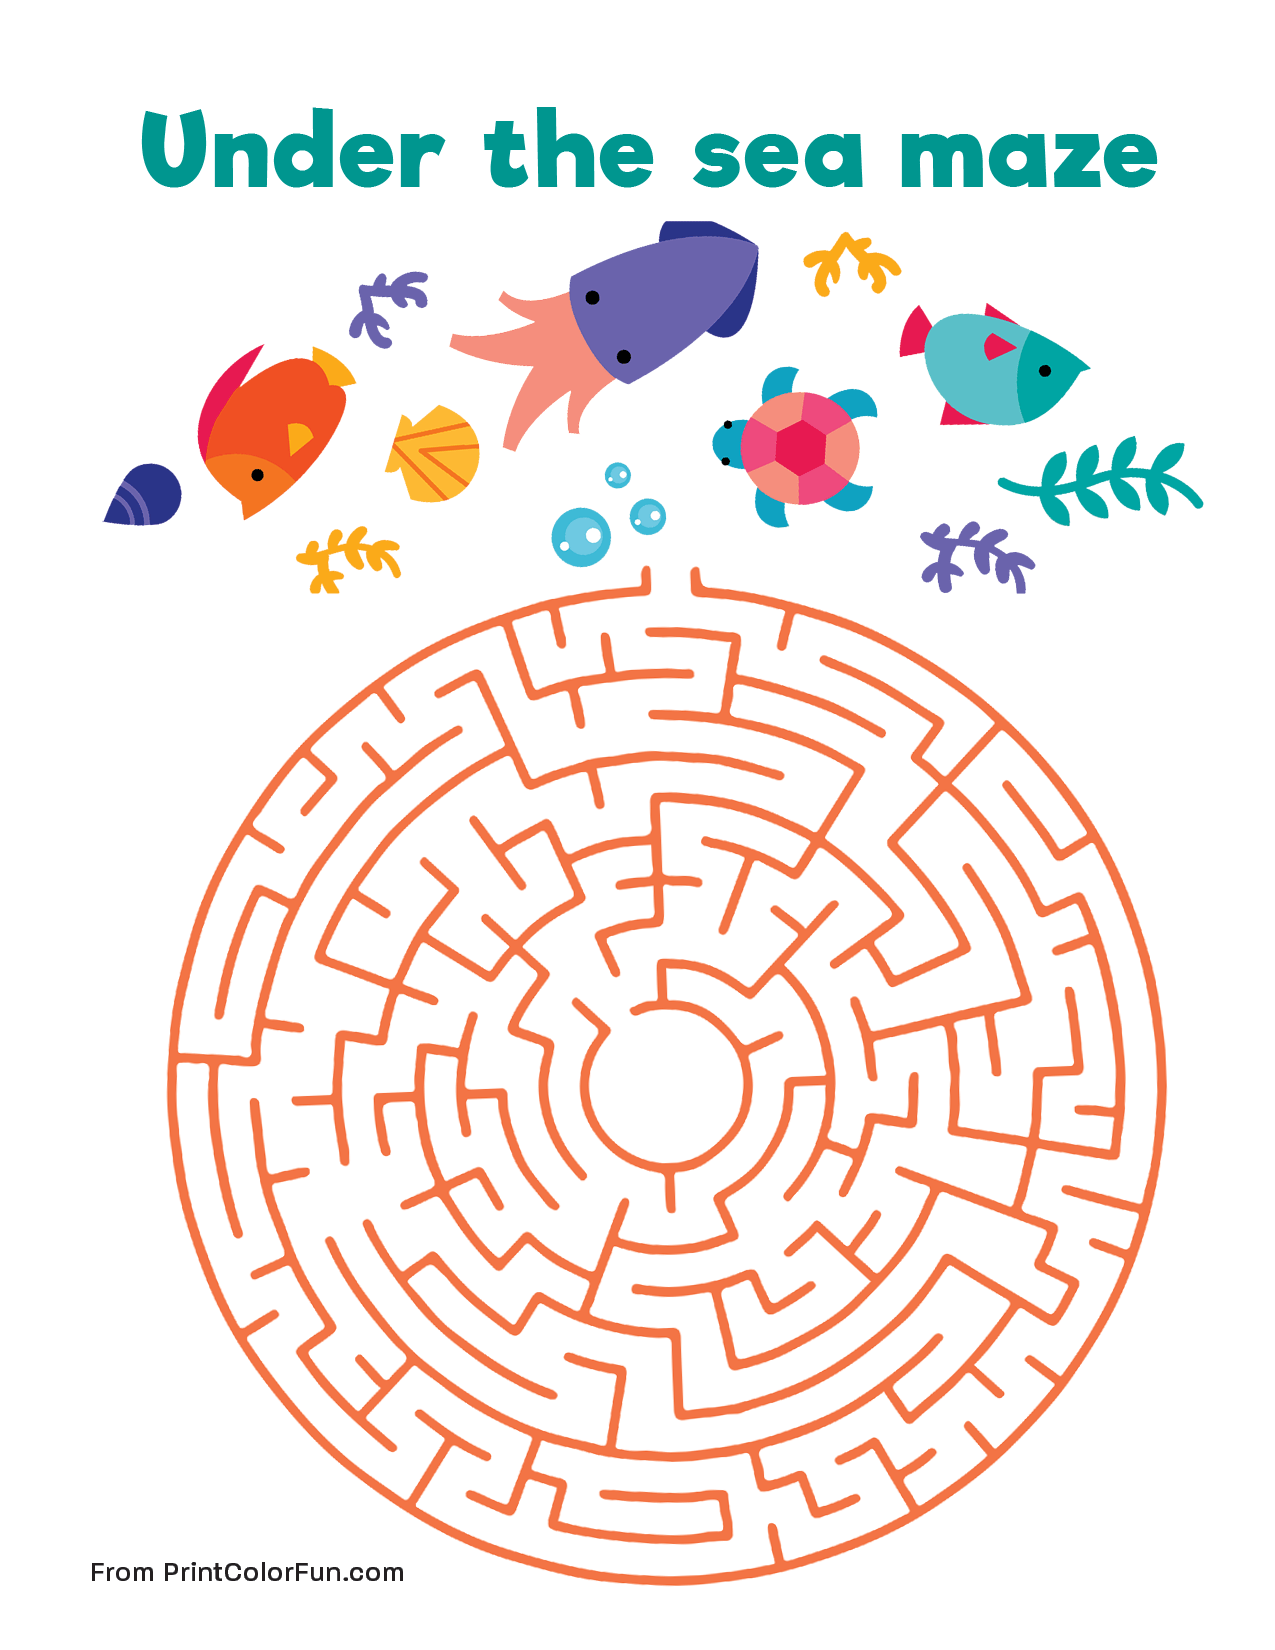 Under the sea maze Medium level